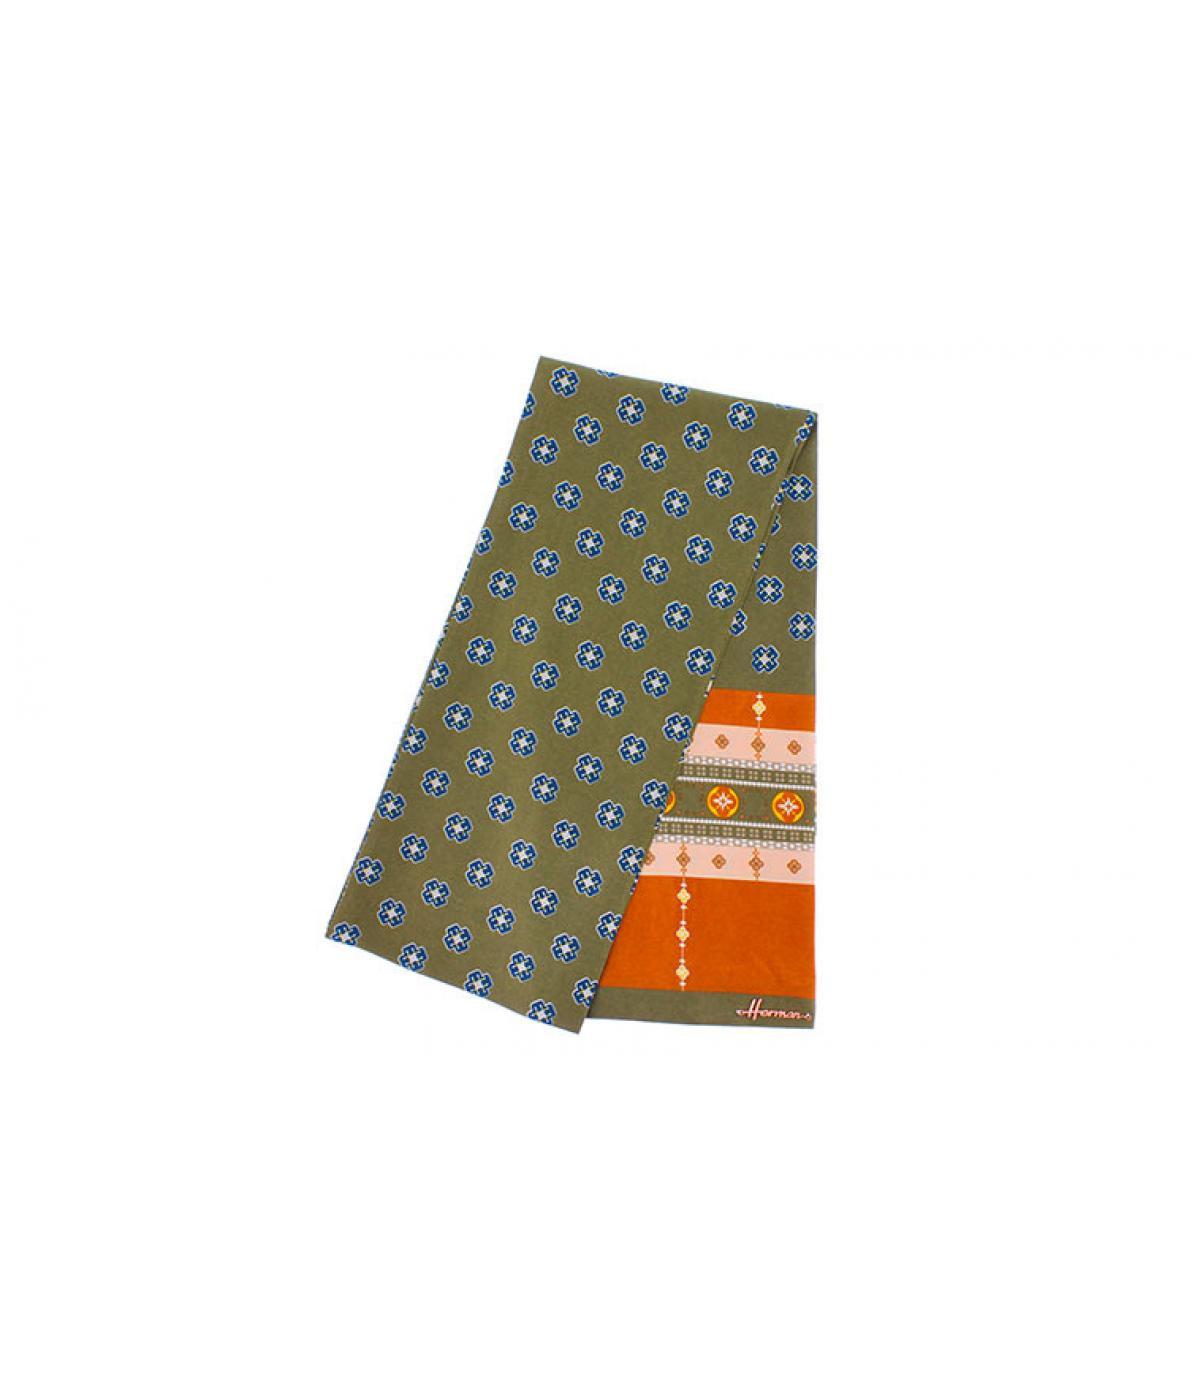 groen oranje vierkante sjaal